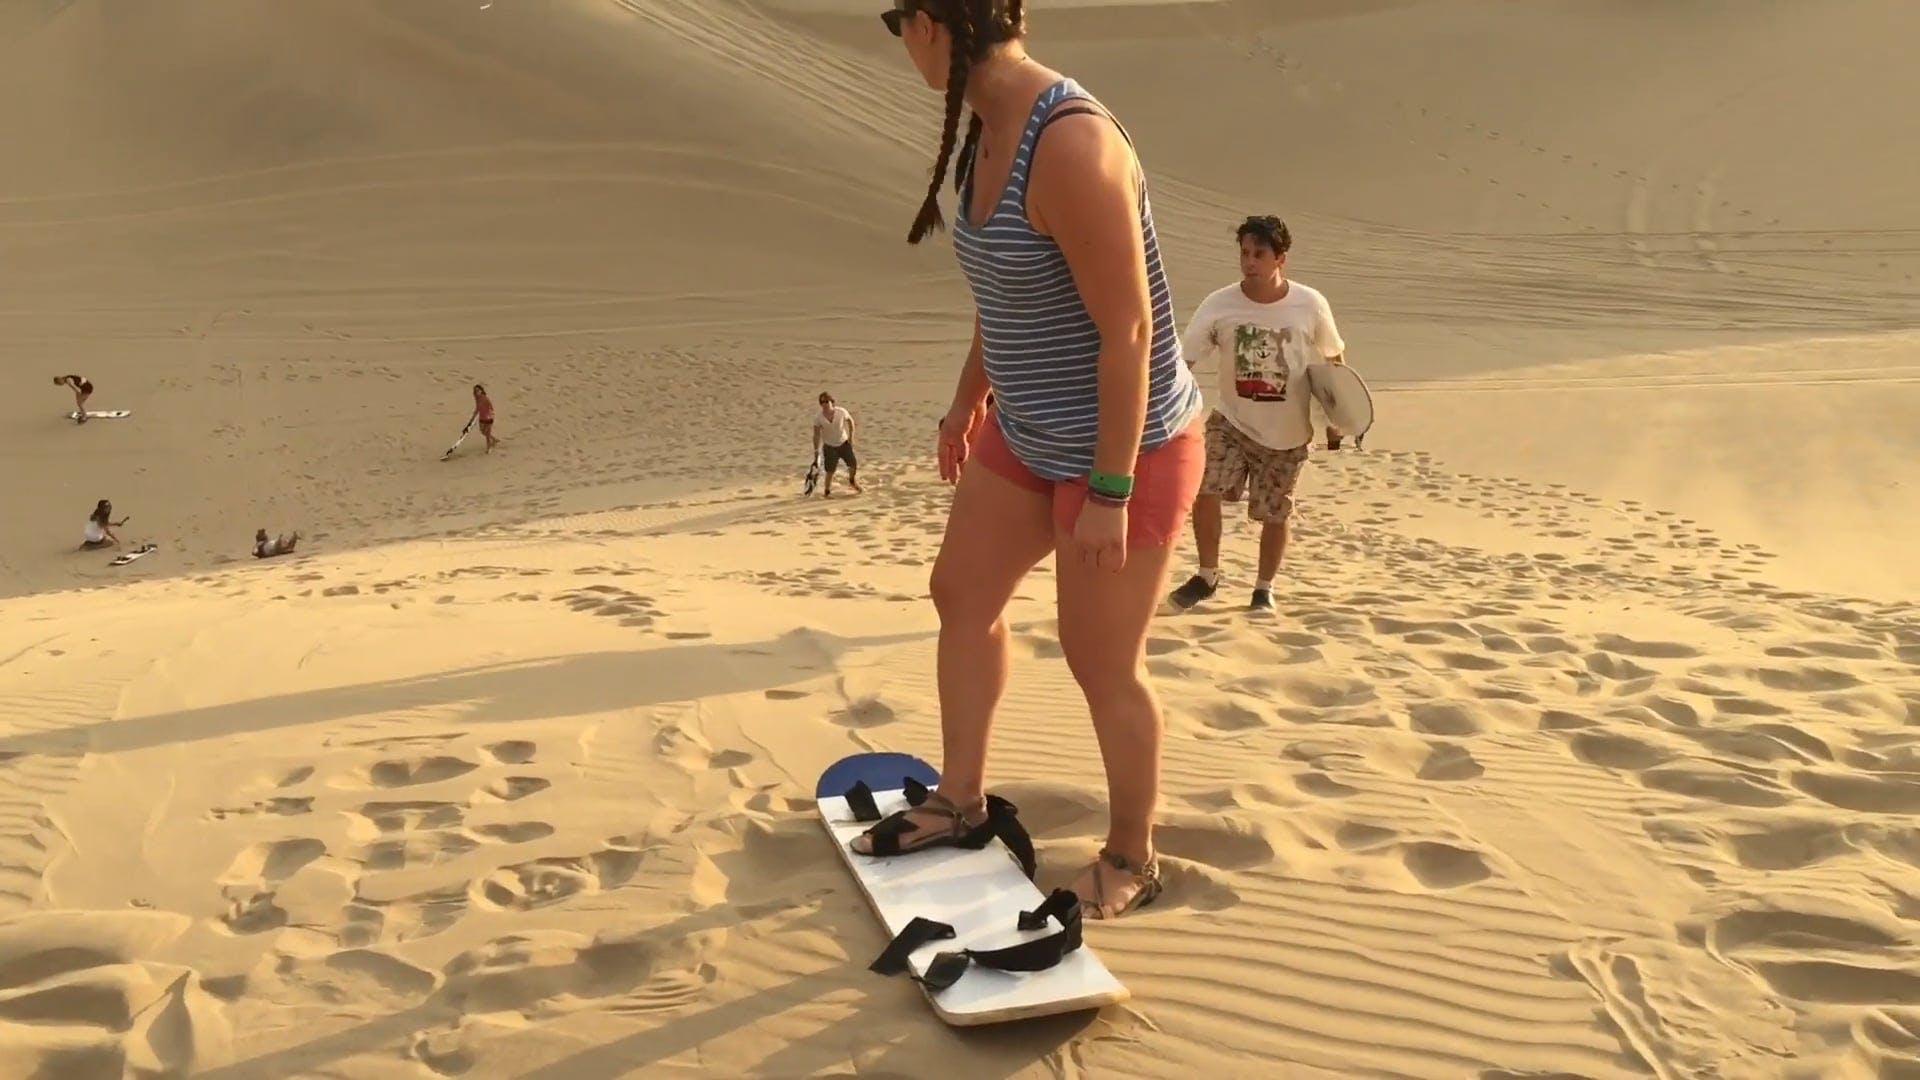 Sandboarding And Sand Sledding